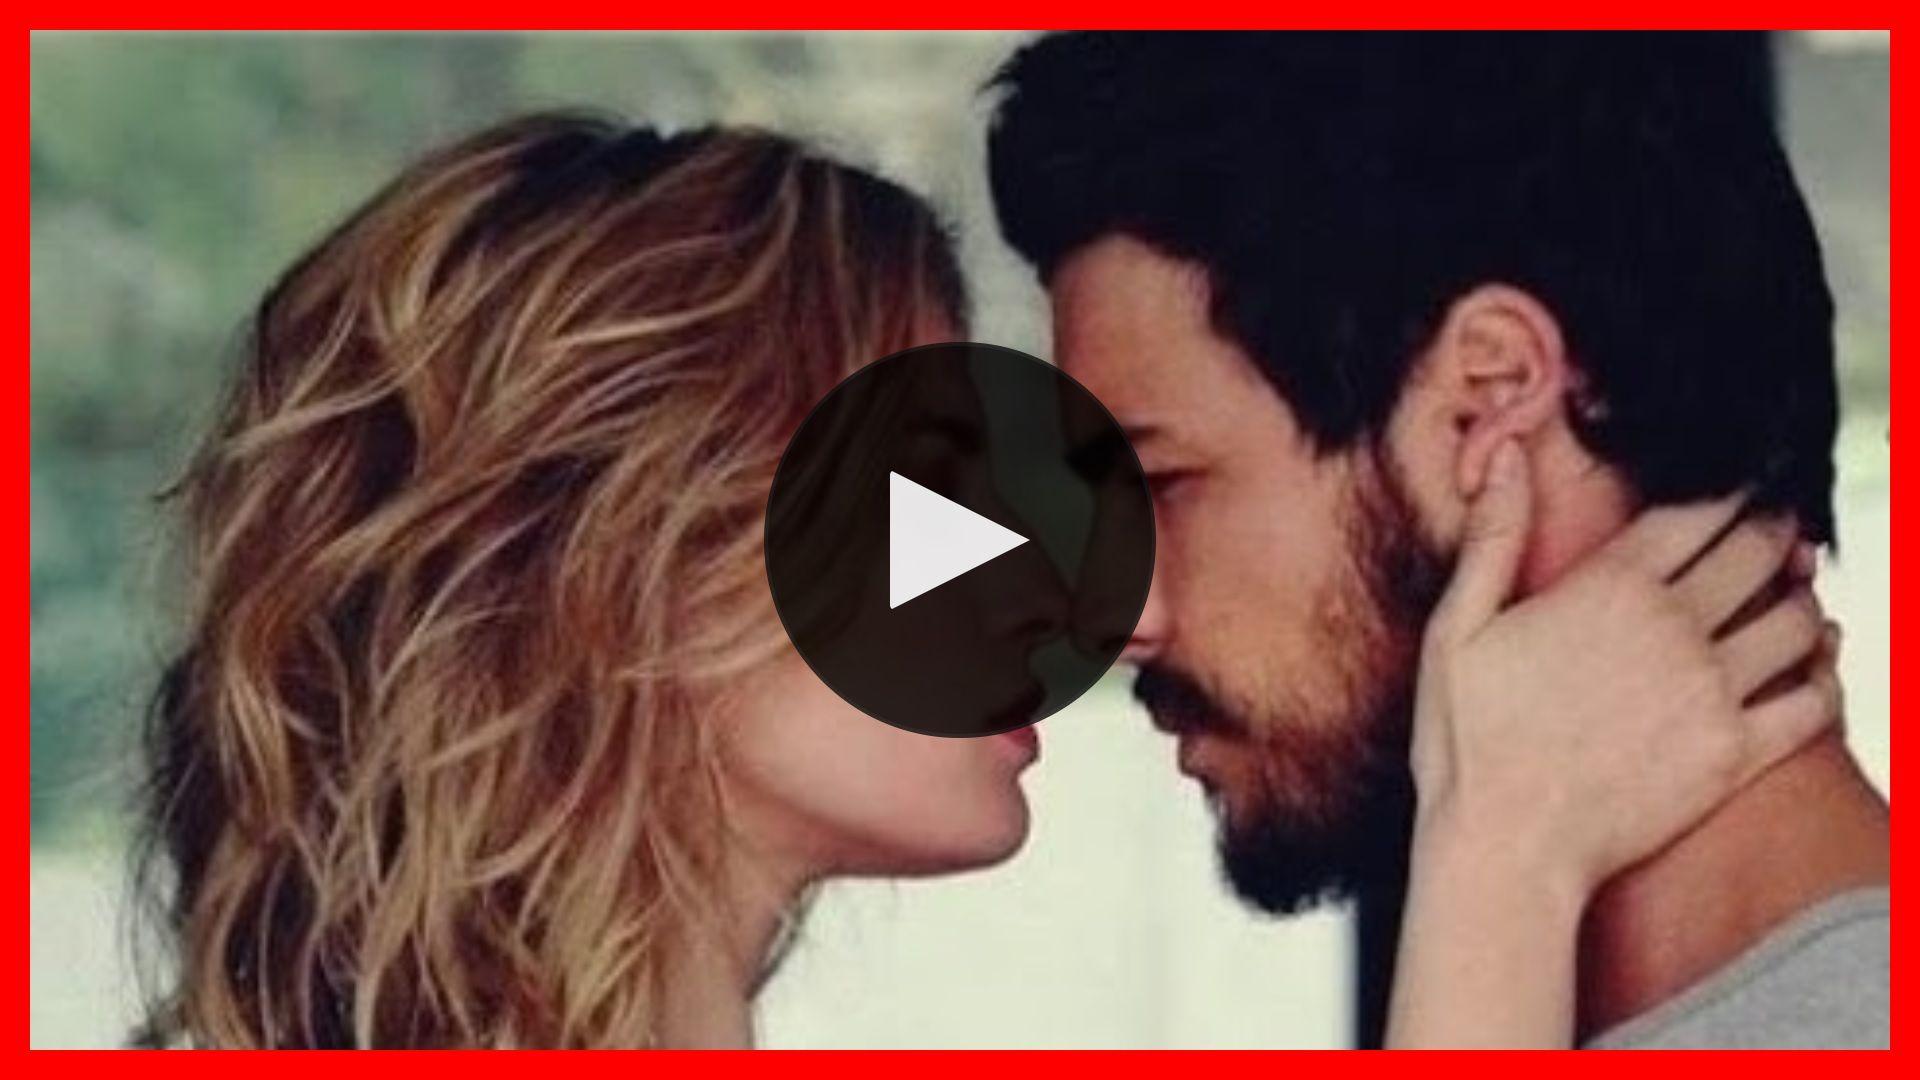 Ver 3 Veces Tu Pelicula Completa Online Espanol Latino Hd 2019 Peliculas Completas Peliculas Romanticas Completas Peliculas Romanticas Gratis